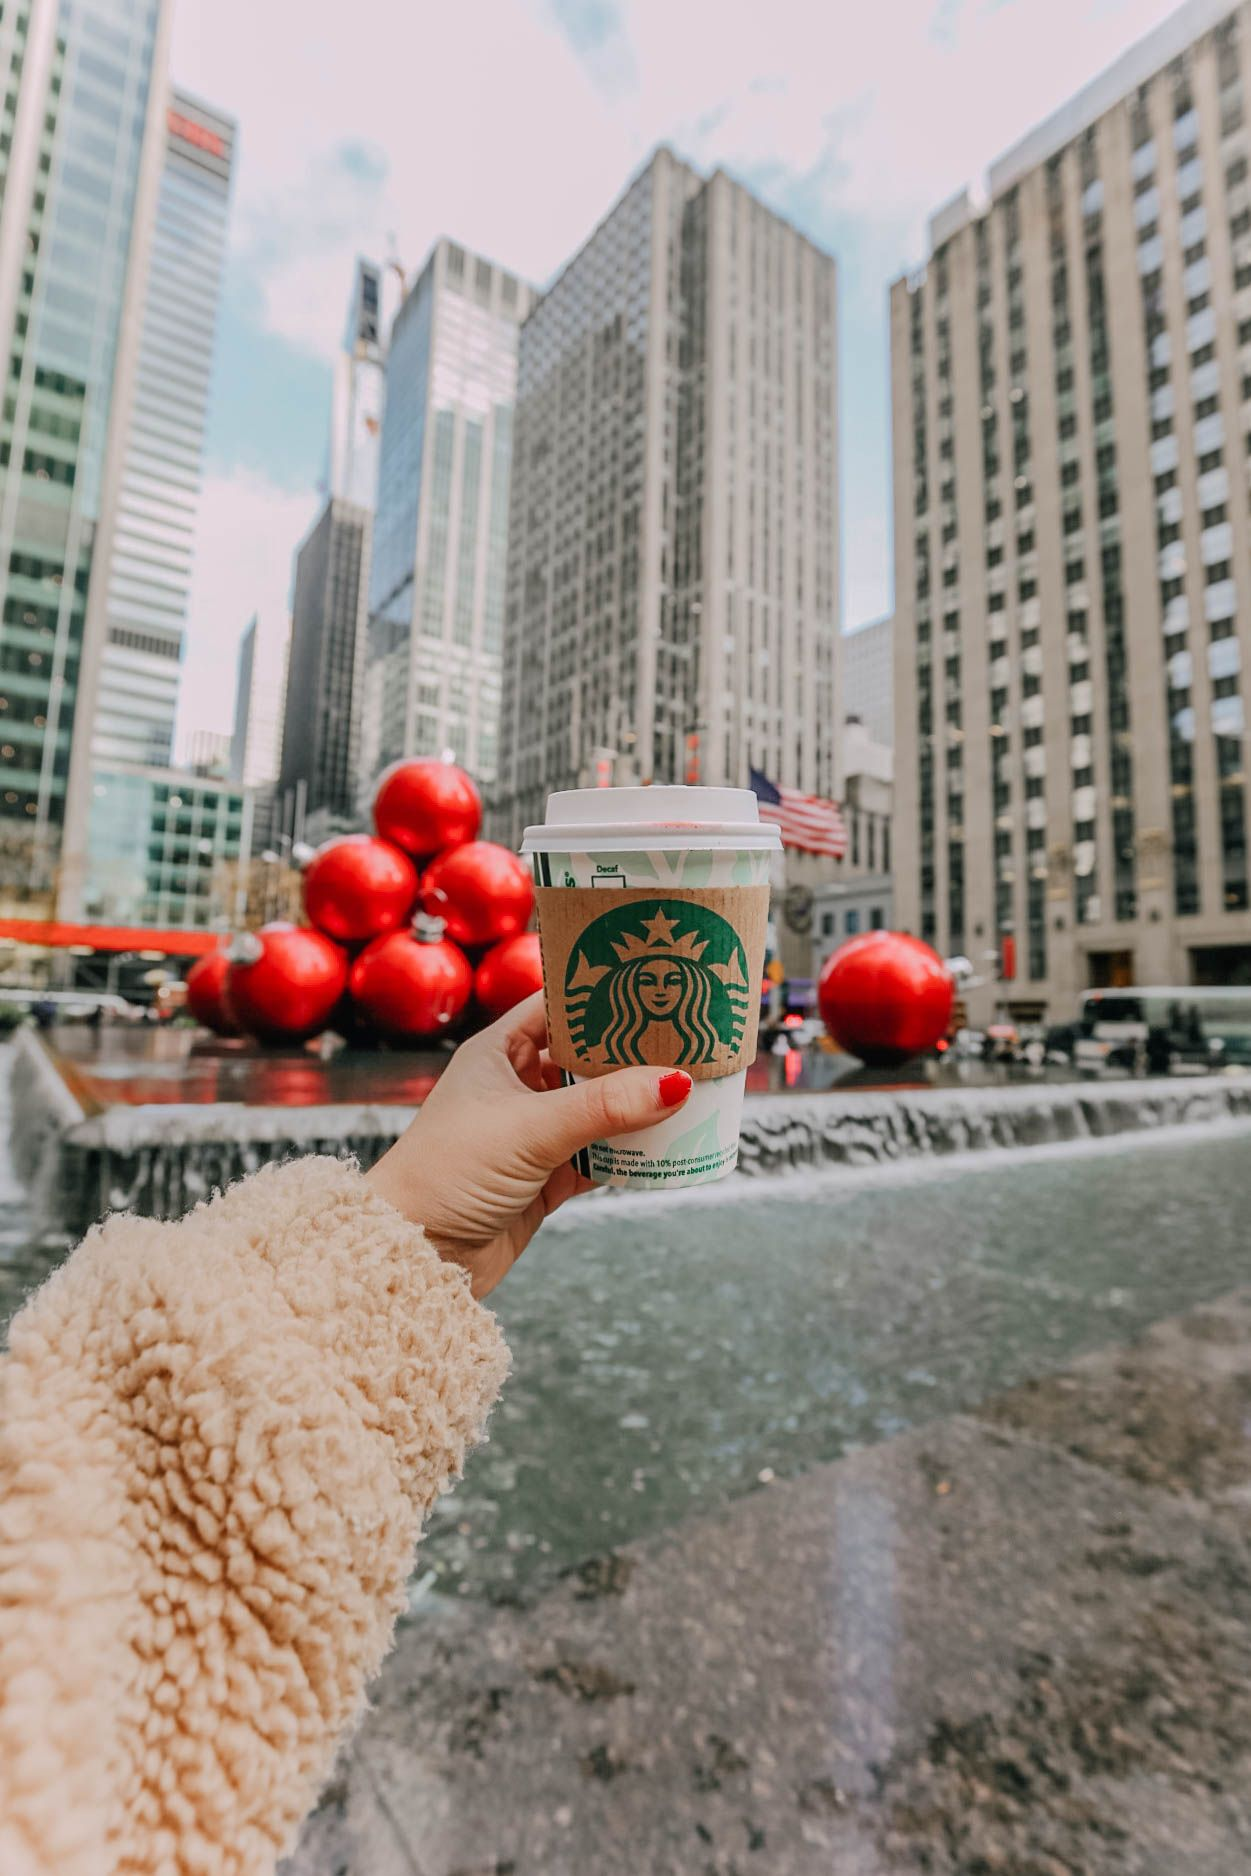 Happy Holidays // #christmas #christmaspictureideas #christmasdecor #cutechristmaspictures #cutechristmaspicturideas #homedecor #decor #christmasdecorations #christmastree #santaclause #christmastreeideas #christmascookies #christmascrafts #christmaspartyideas #christmasoutfit #christmasoutfits #christmasmovies #flatlays #christmasflatlay #winter #winterwonderland #ootd #ootdwinter #fashion #cutewinteroutfits #winteroutfitideas #christmas2018 #christmas18 #santaclause